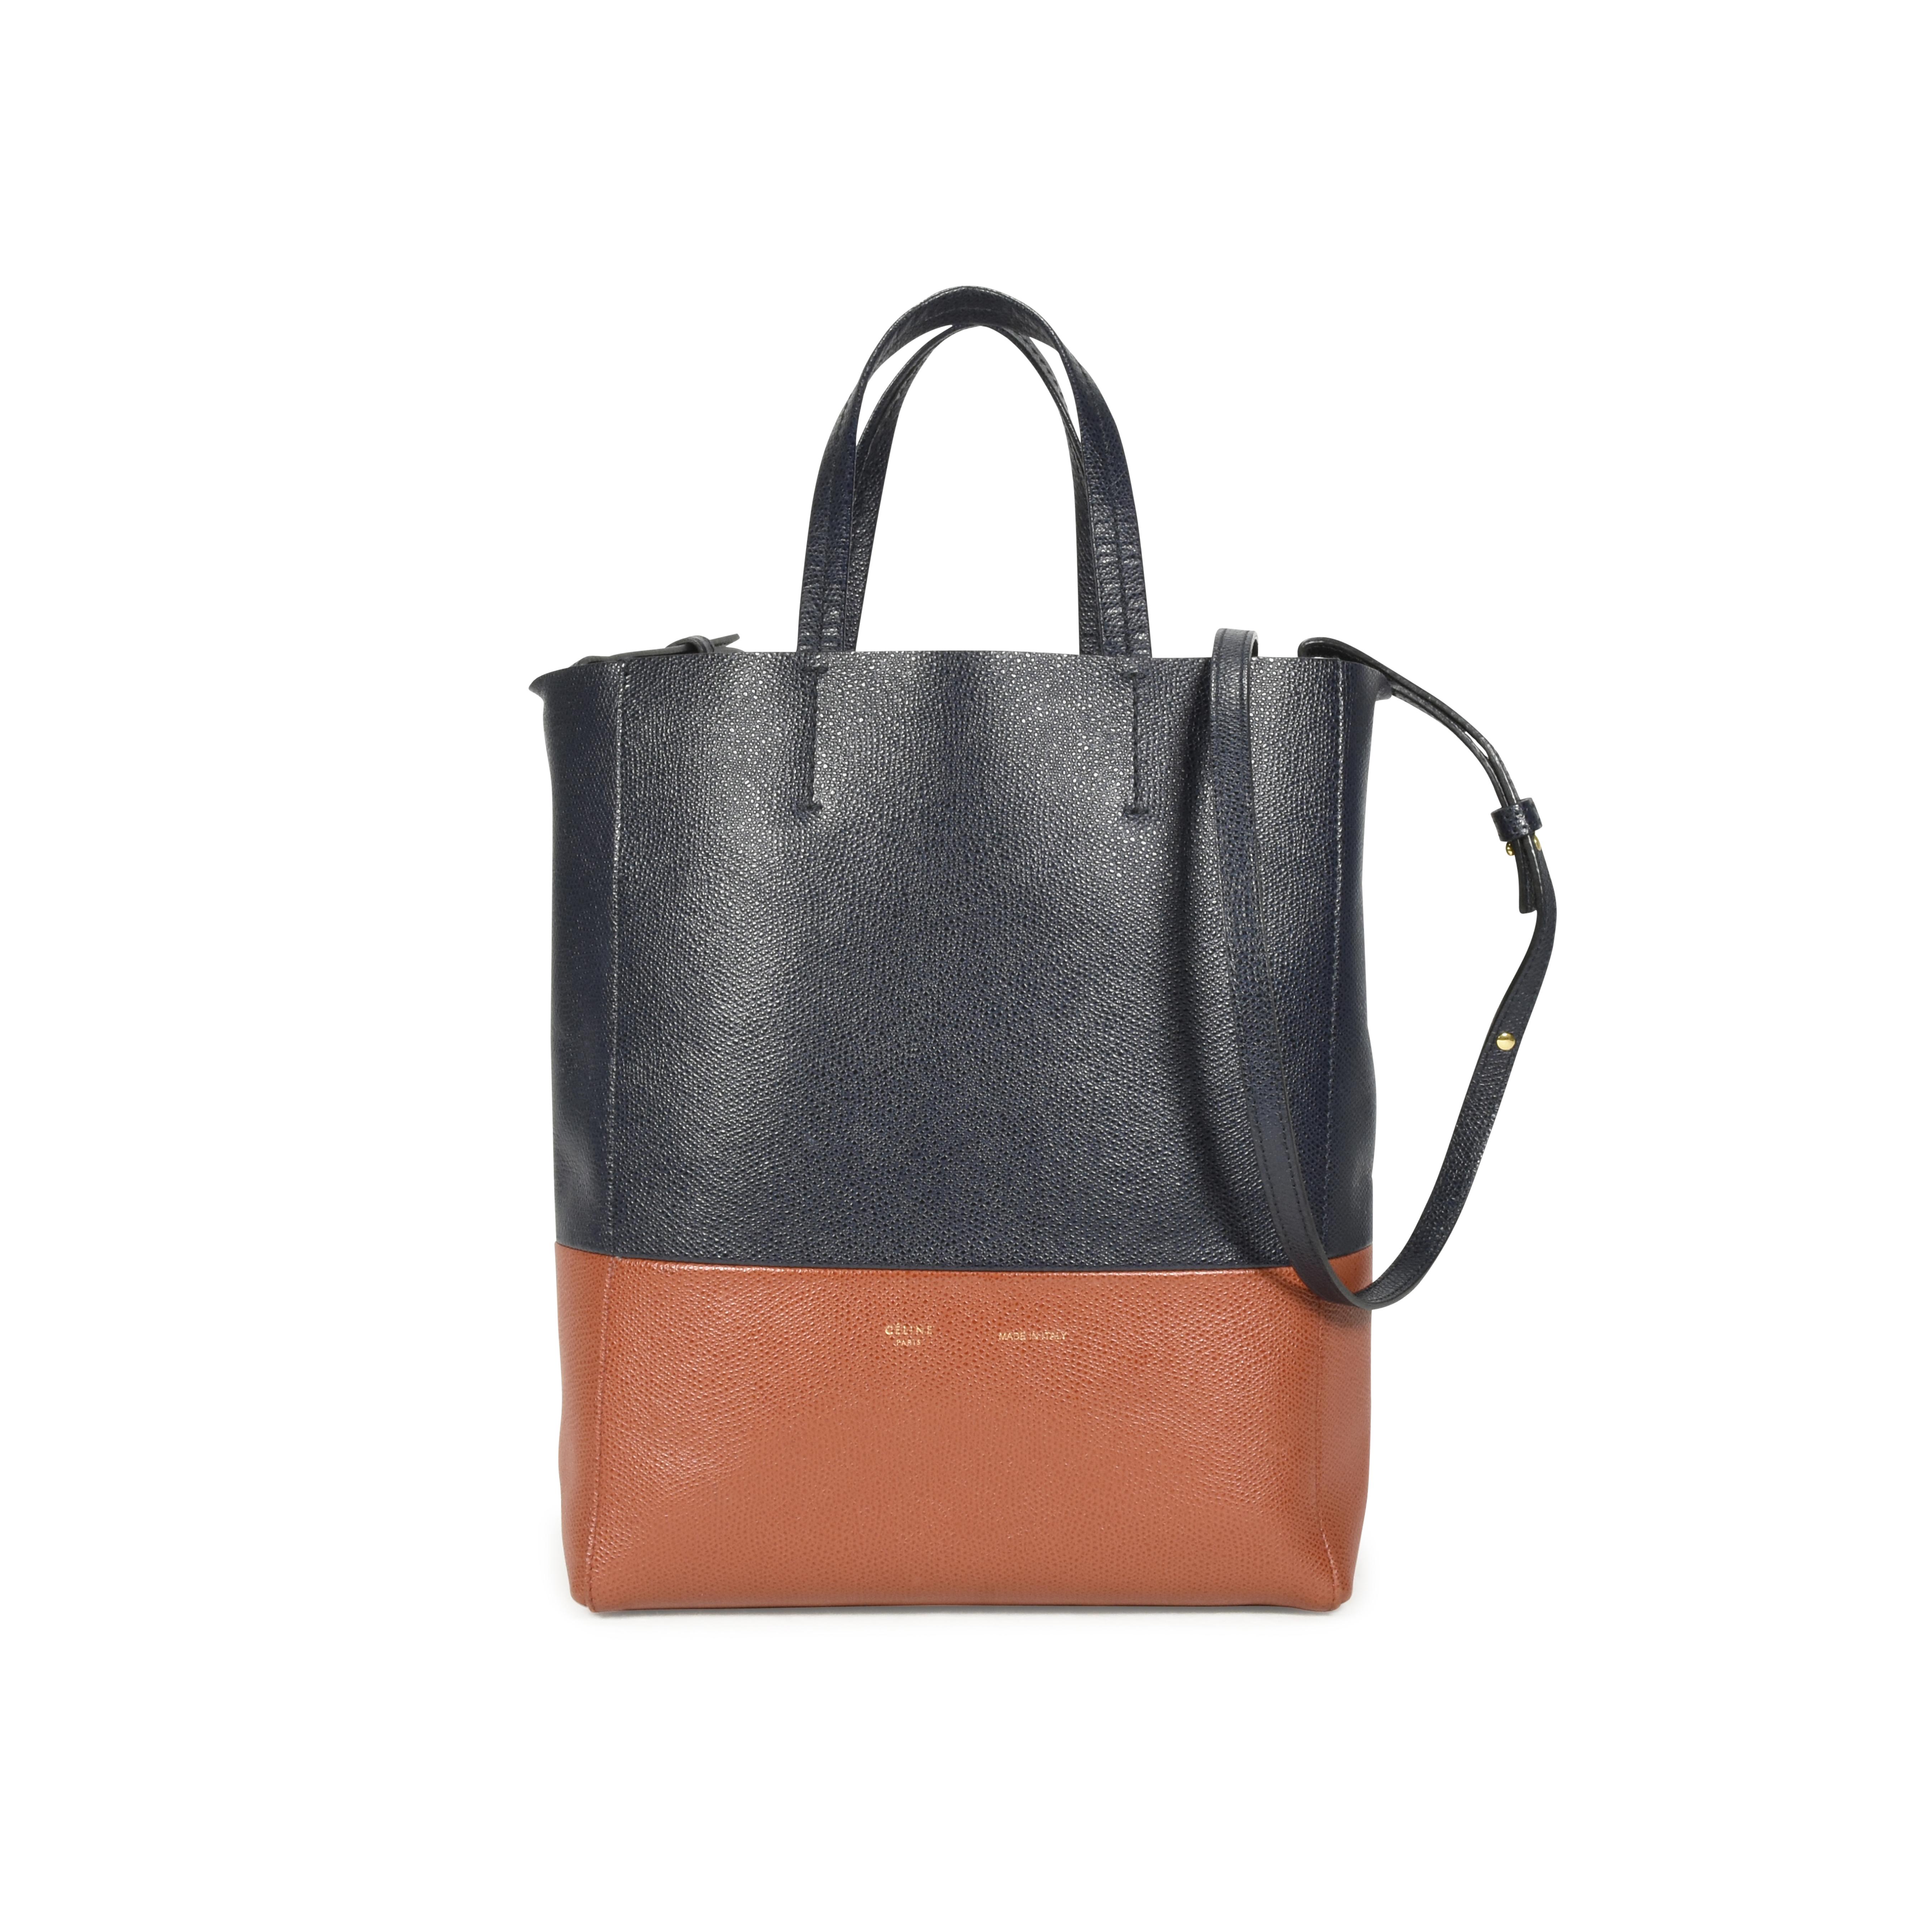 Authentic Second Hand Céline Small Vertical Cabas Tote Bag (PSS-139-00029)   e119693d7164a